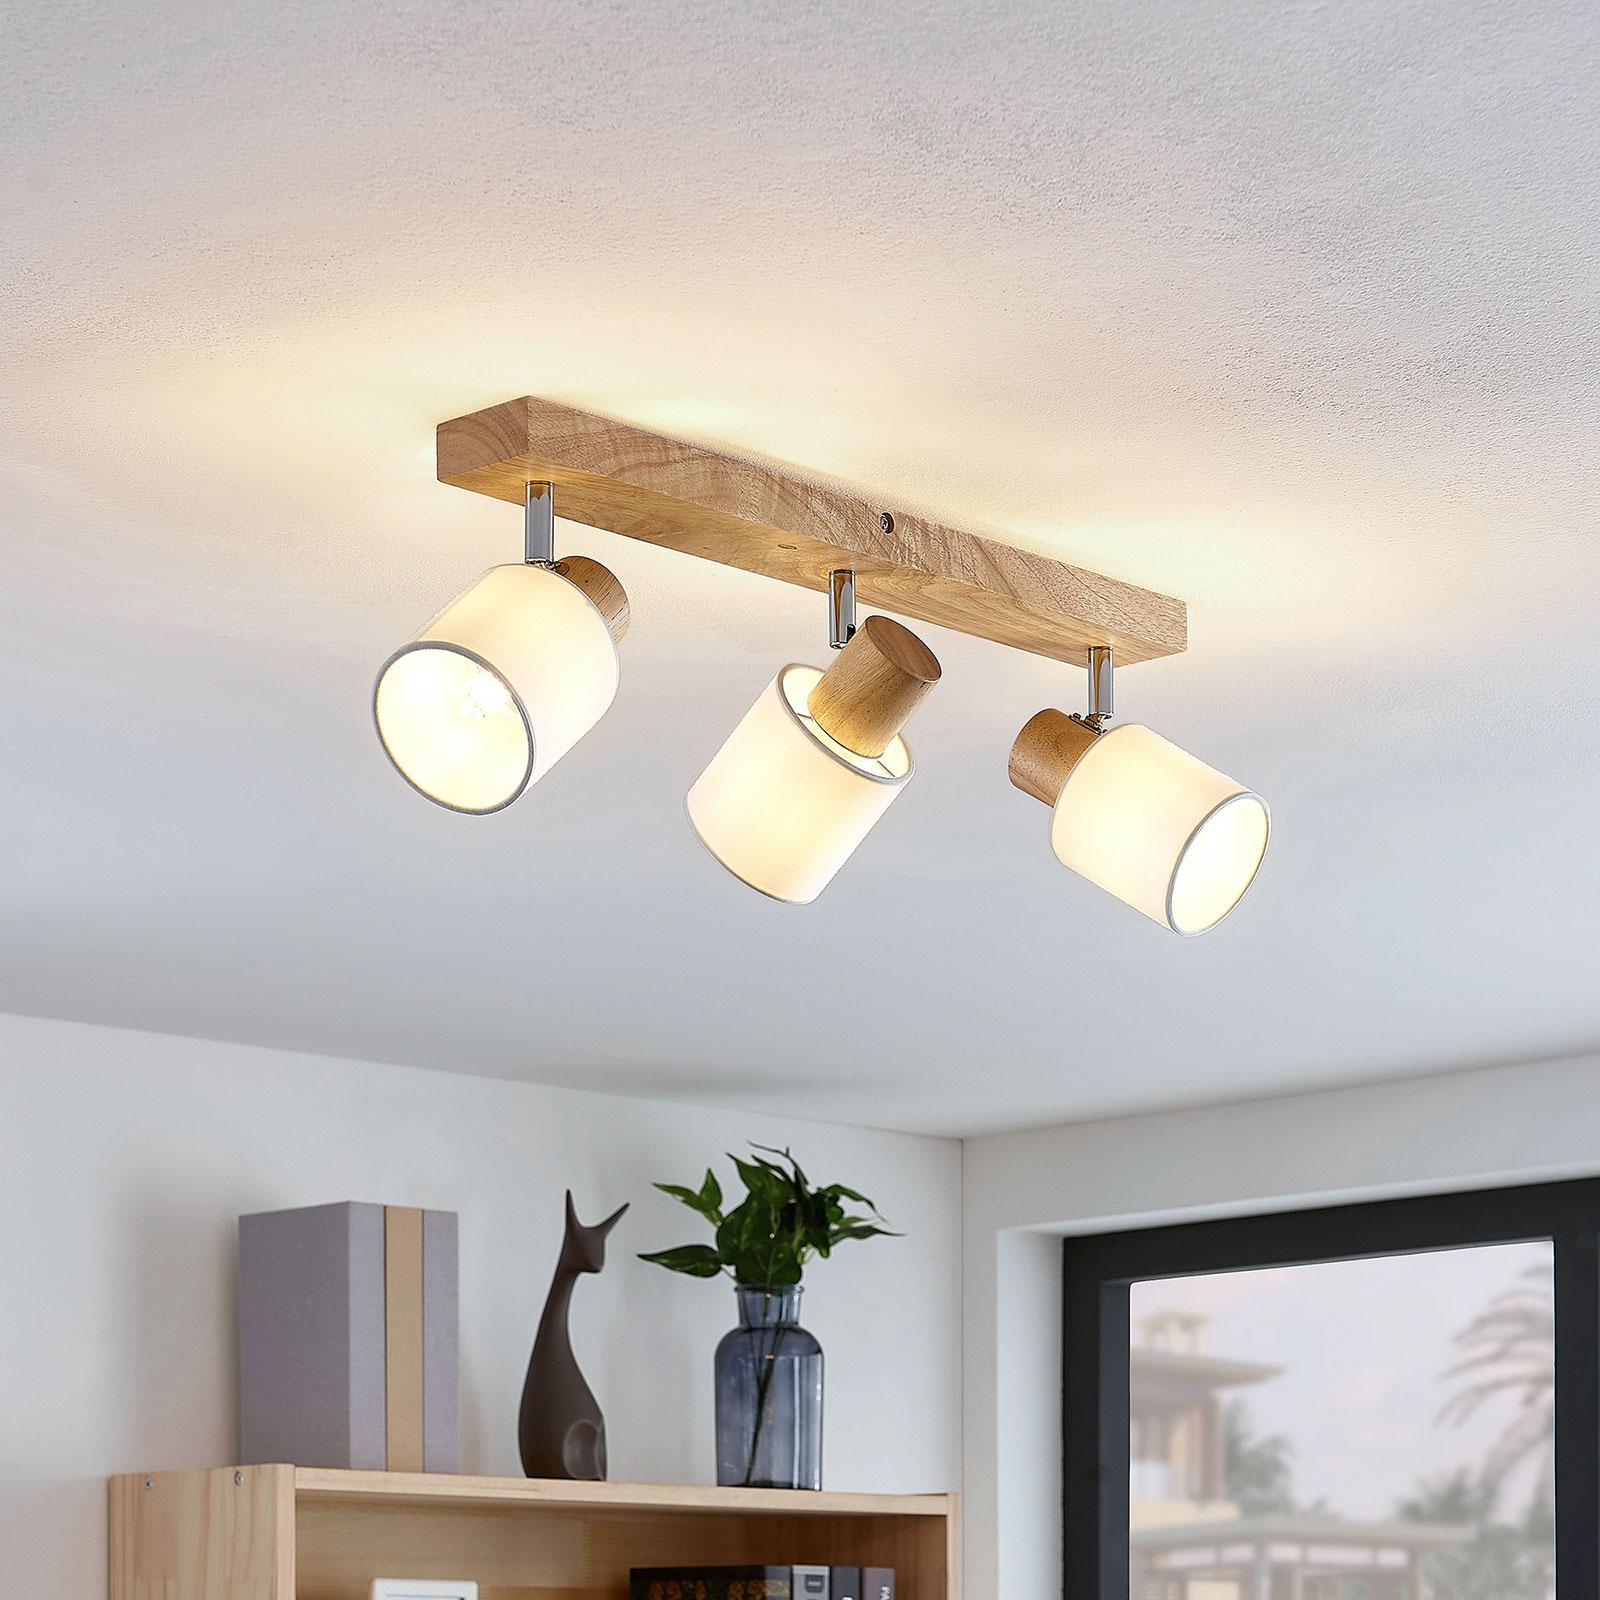 Lindby Wanessa foco de techo, 3 luces